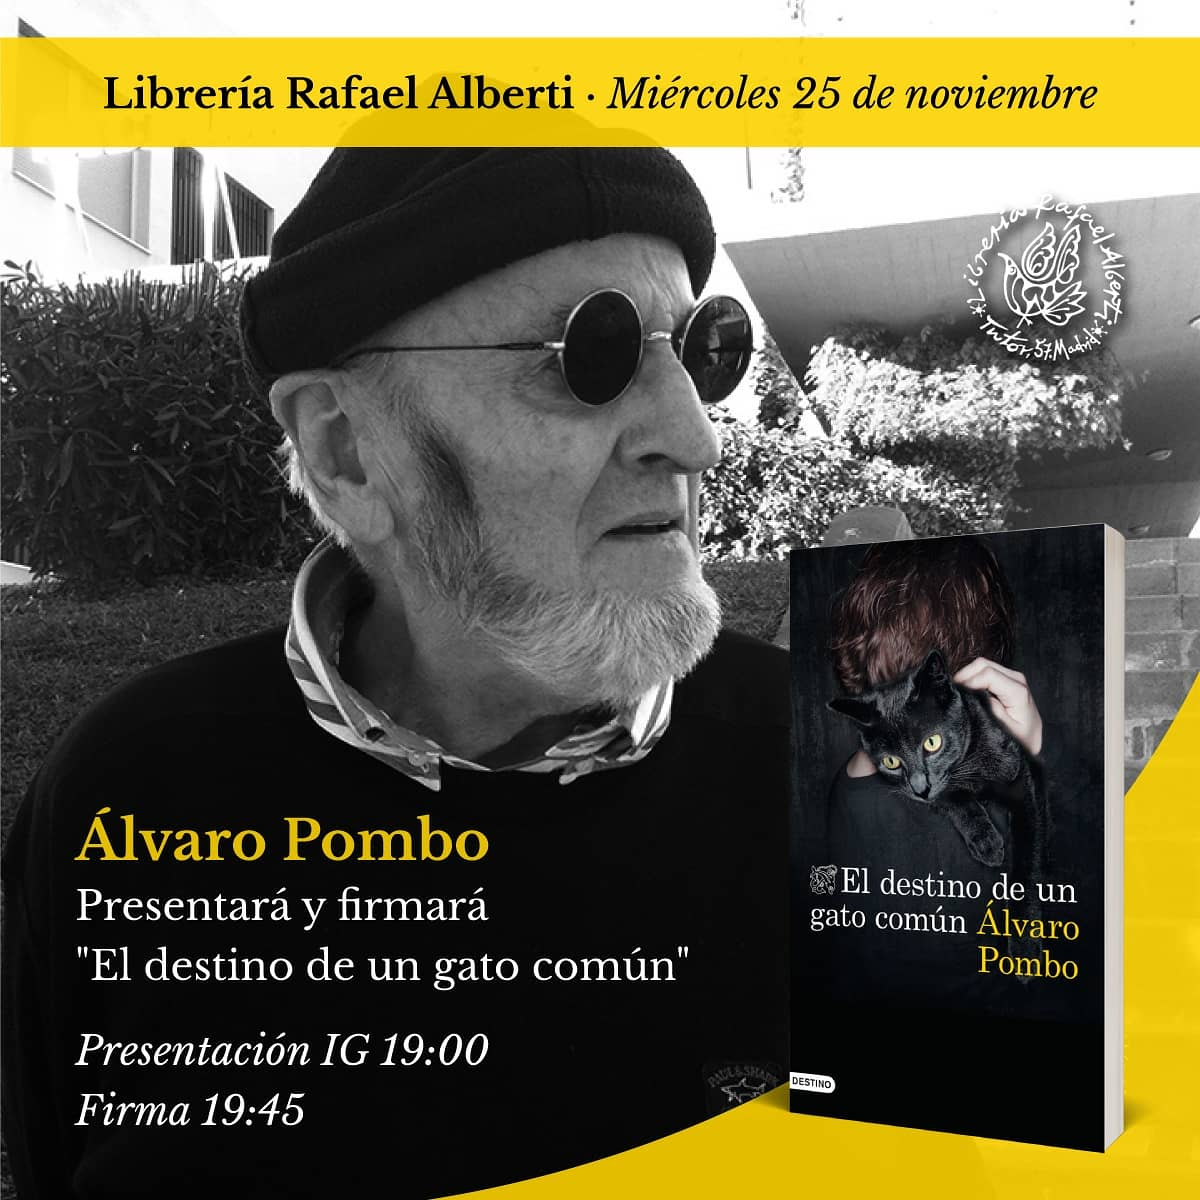 Álvaro Pombo en Alberti